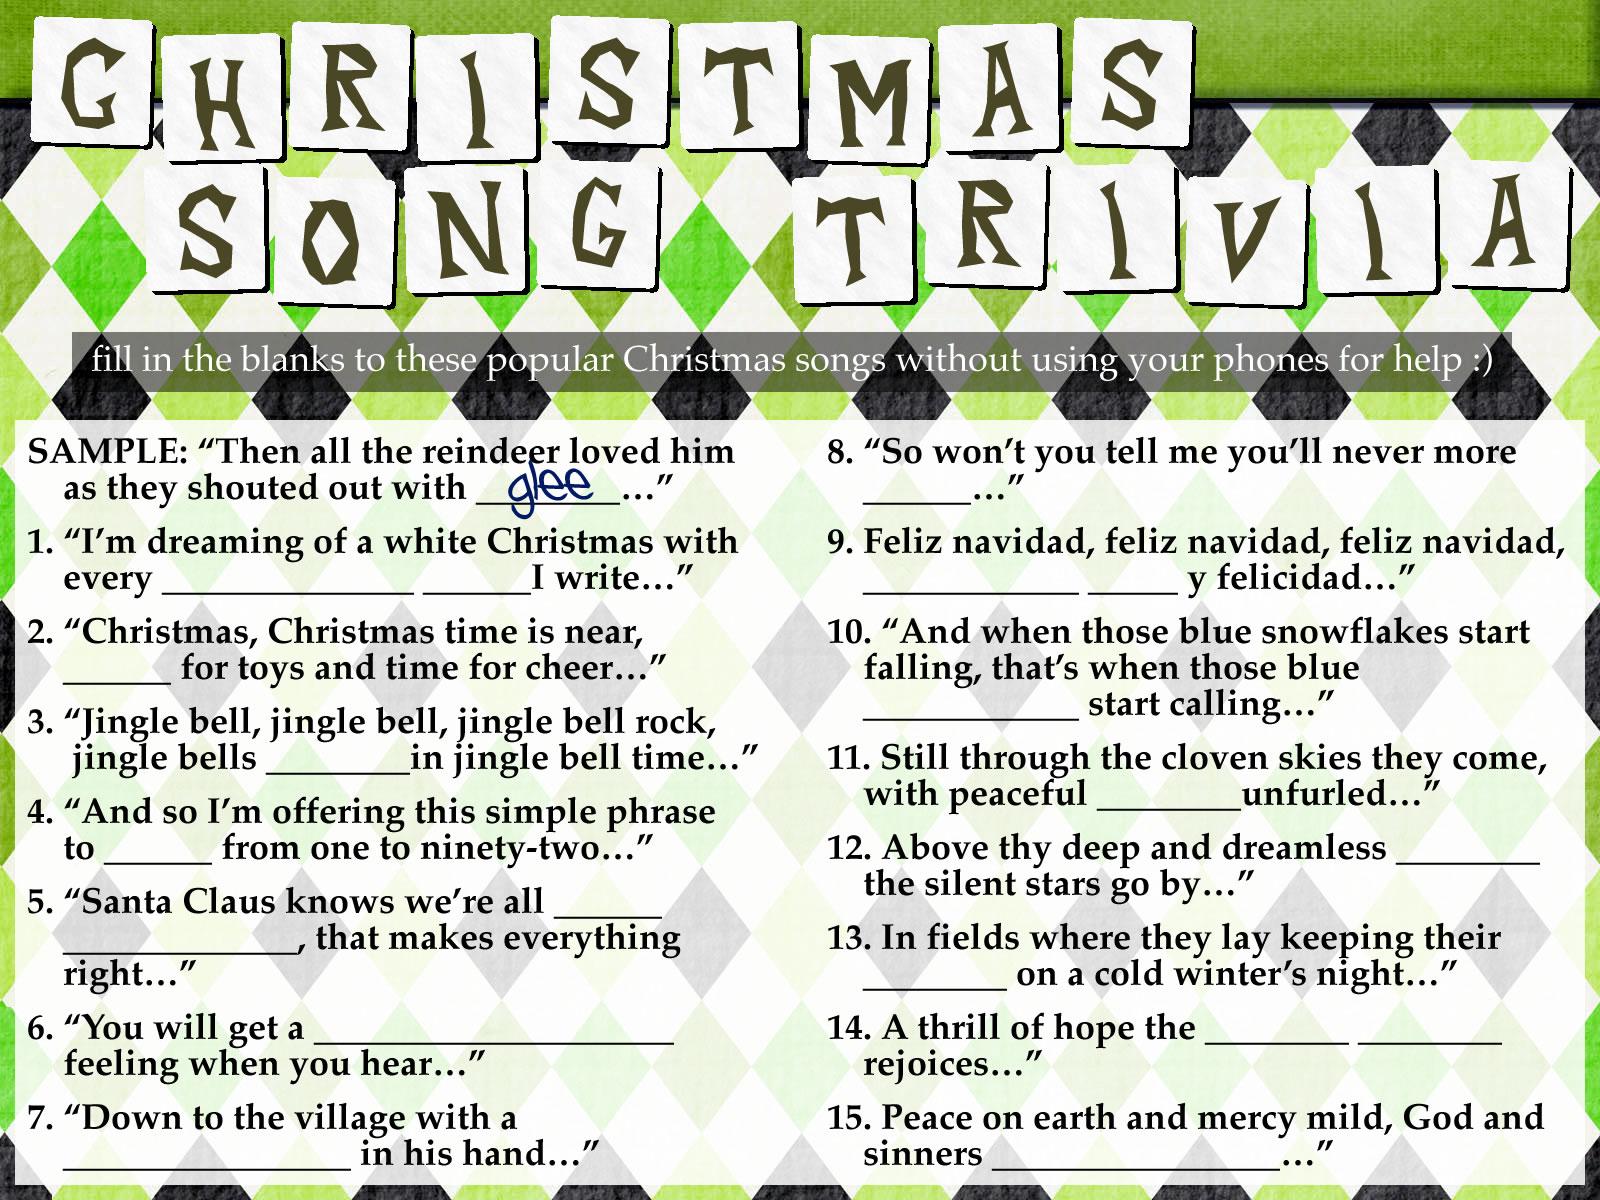 Freebie Christmas Song Trivia